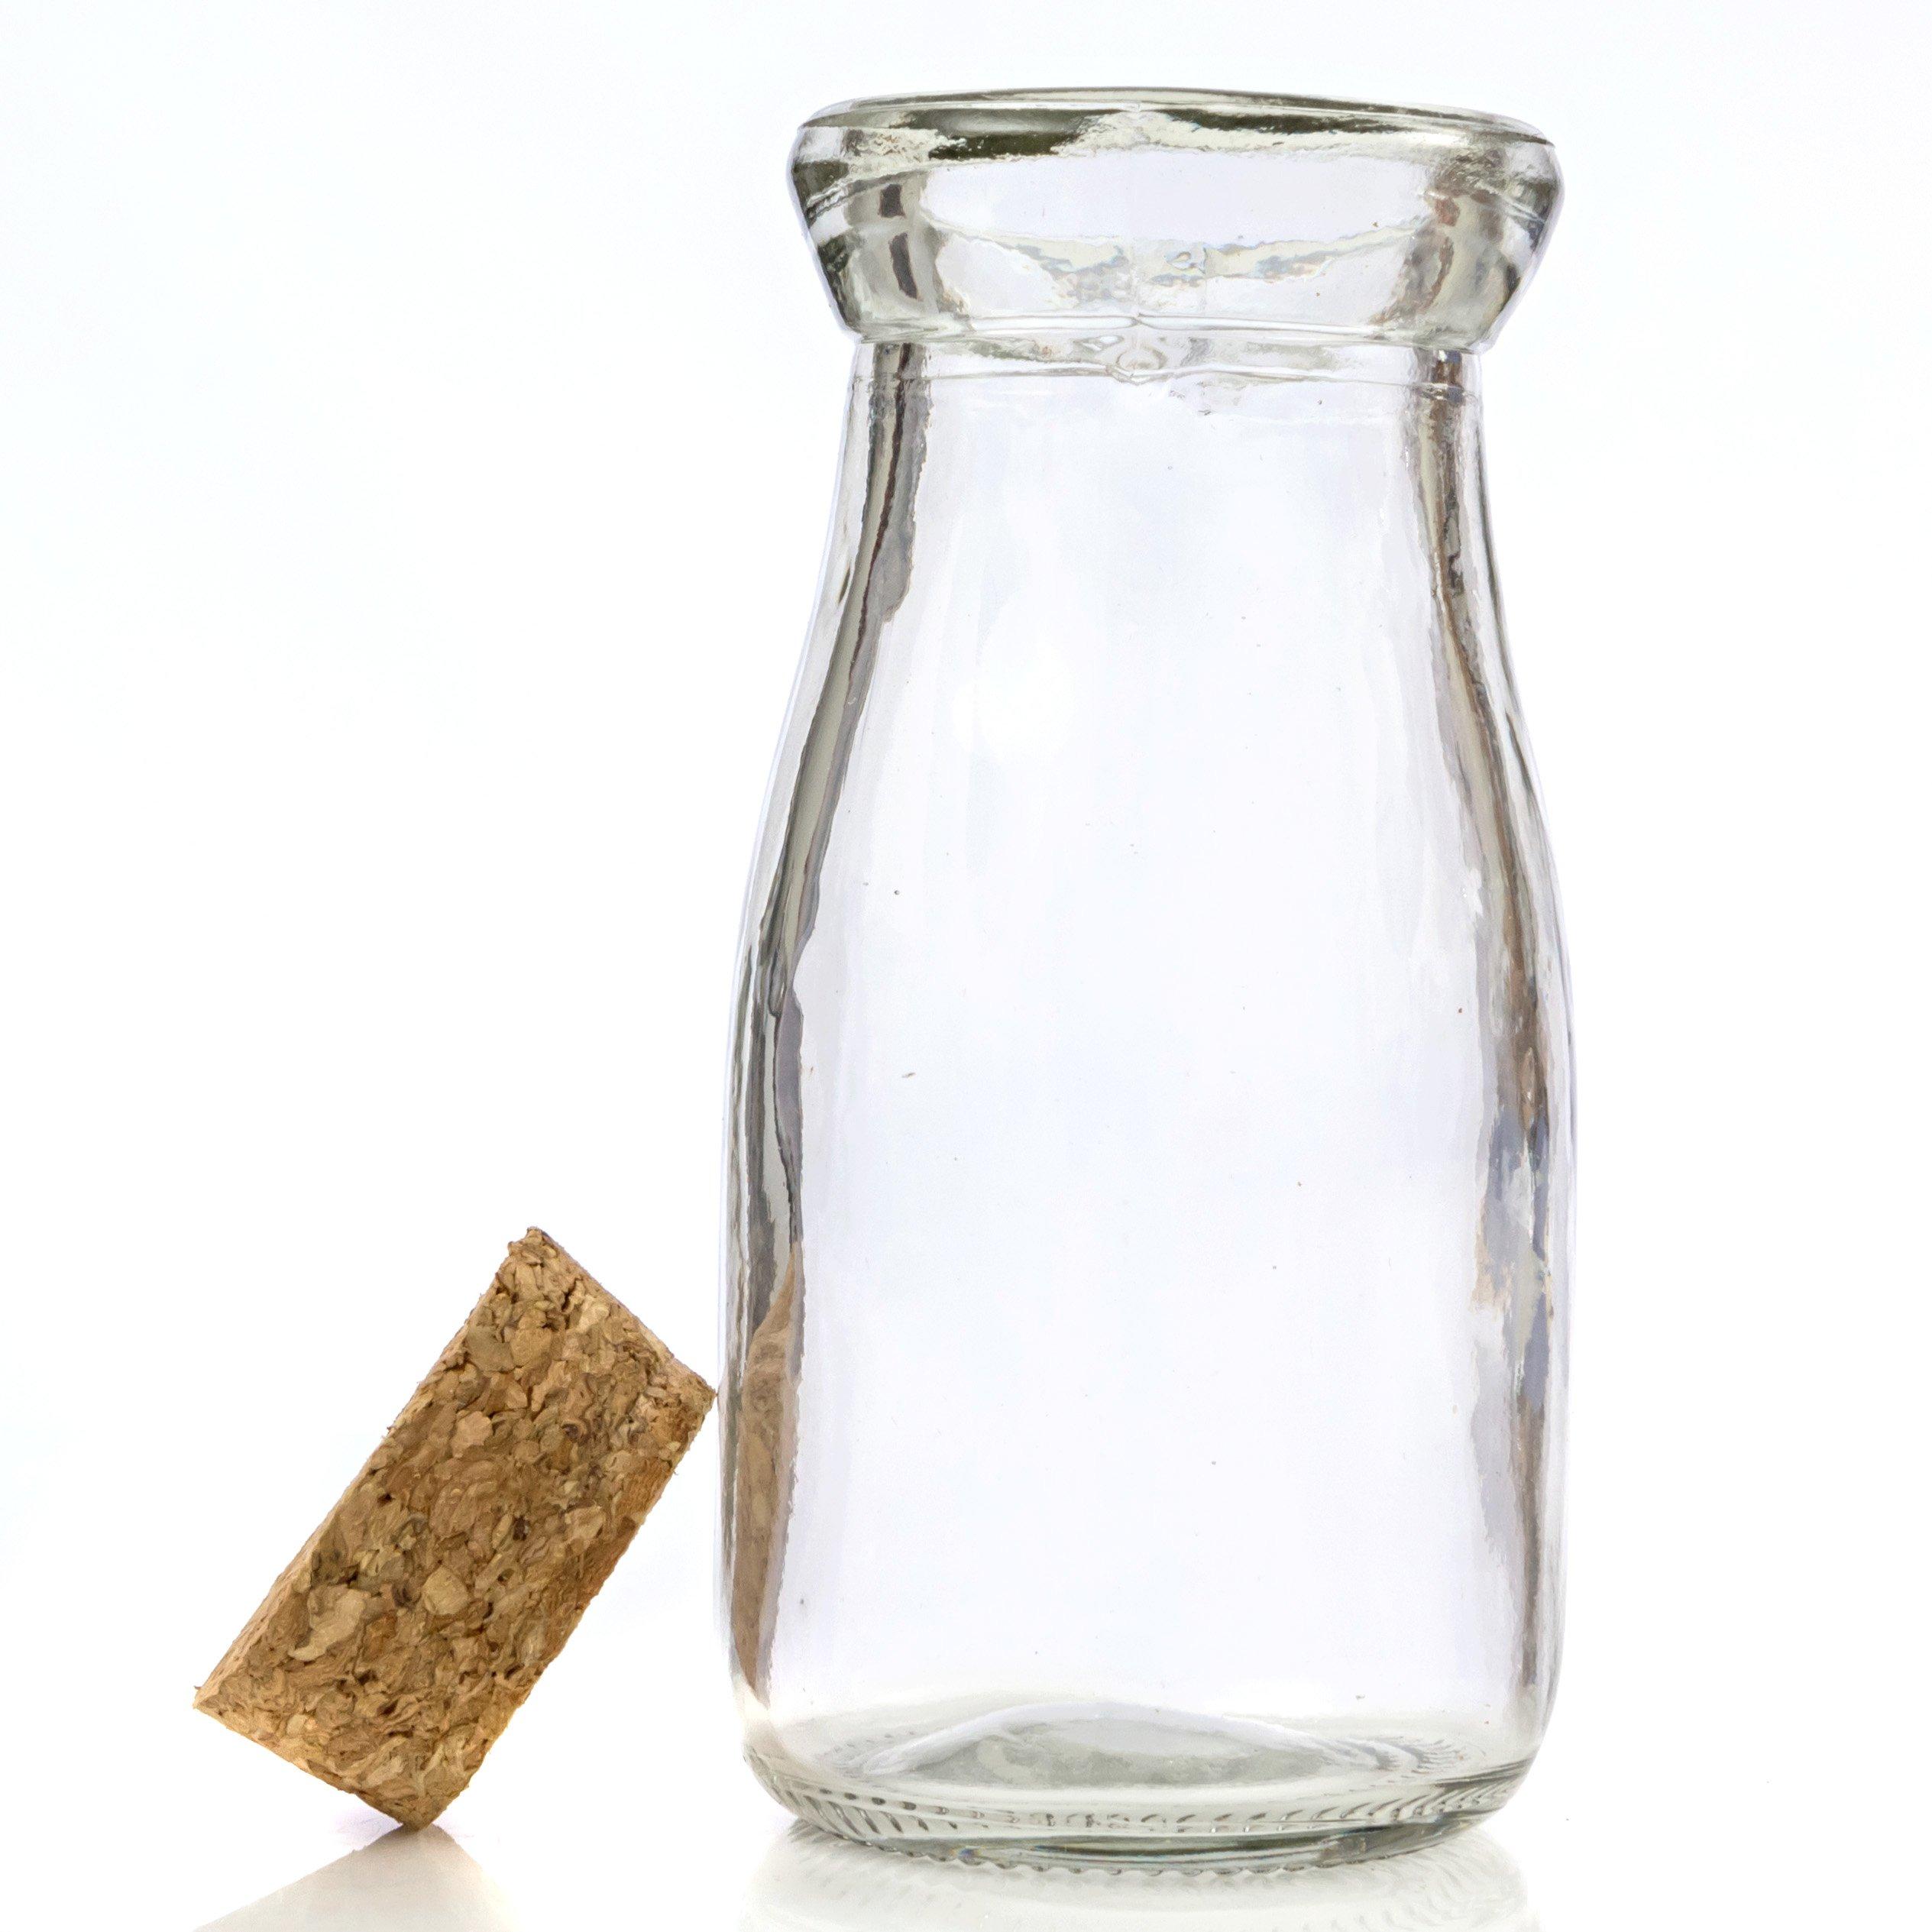 Mini Vintage Glass Milk Bottles with Cork 24 pieces for Favors, Parties